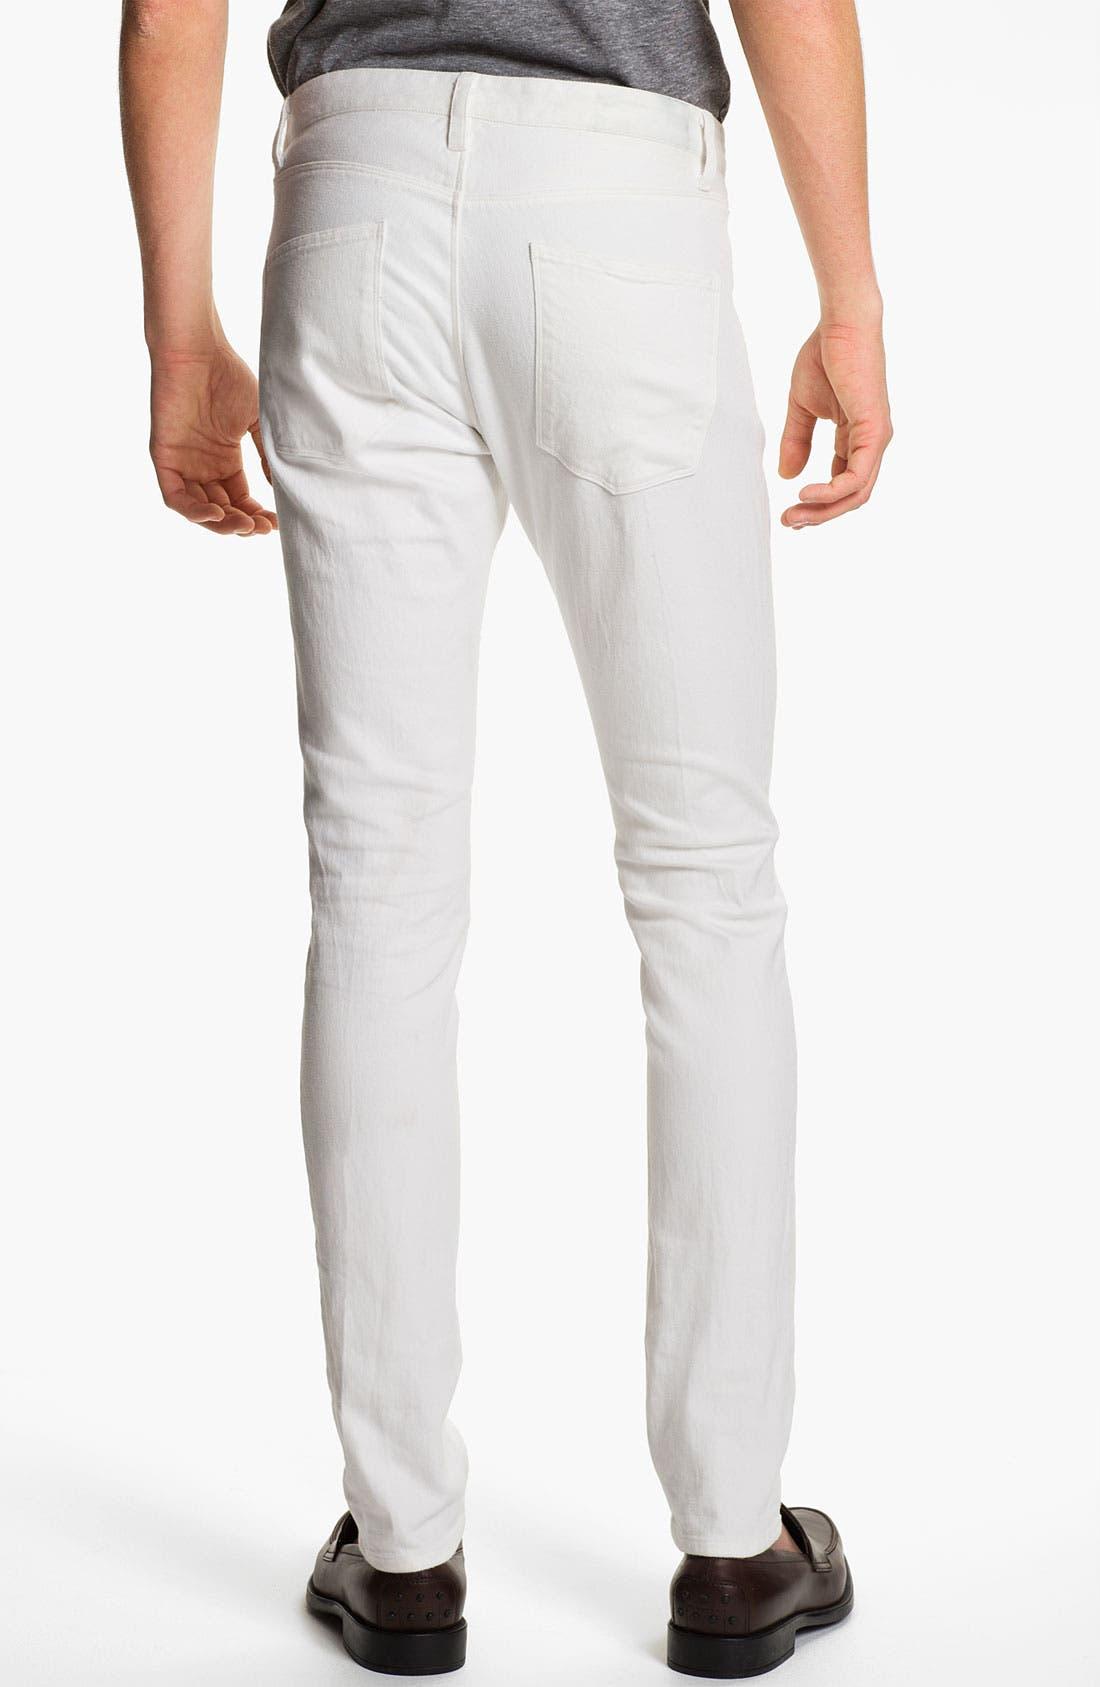 Main Image - Theory 'Raffi P Jost' Slim Leg Jeans (Online Only)